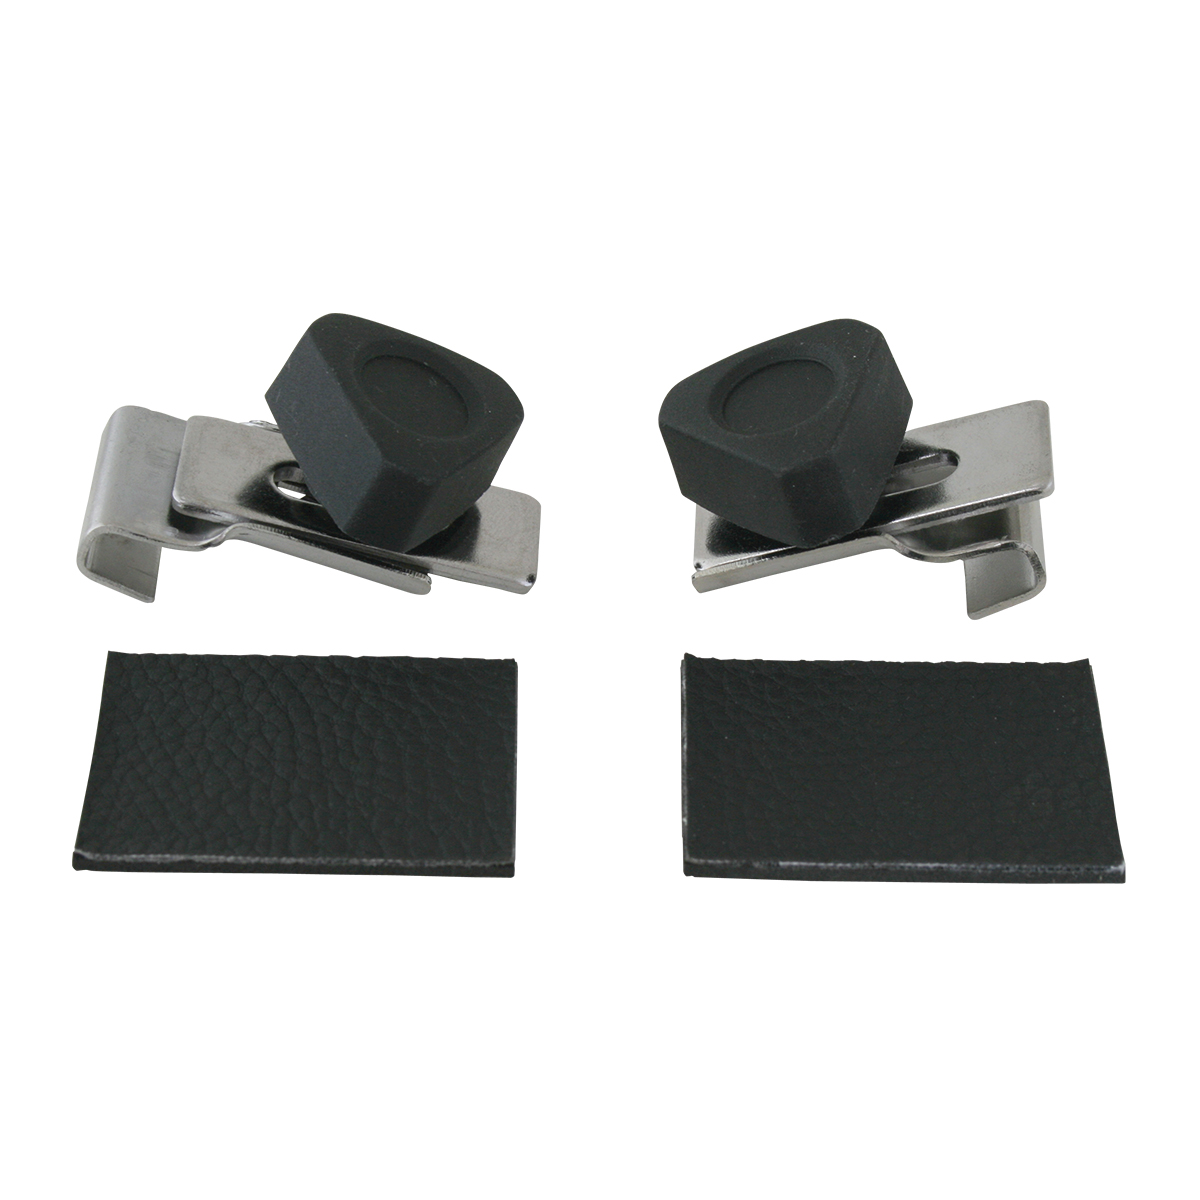 #95010 Chrome Plated Steel w/ Plastic Turn Knobs Vent Window Lock